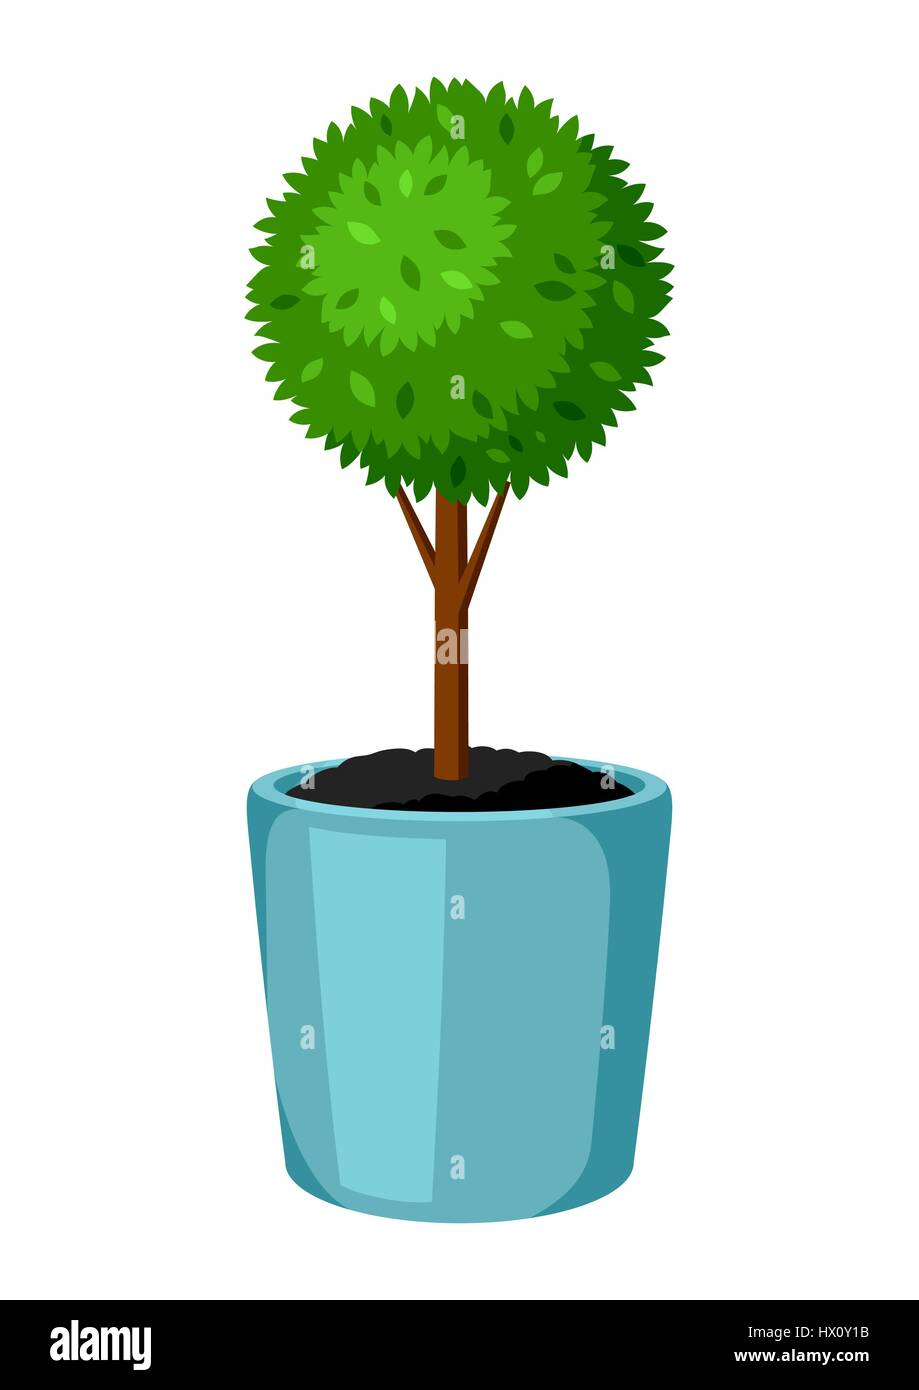 image decorative decor vector free royalty background tree trees